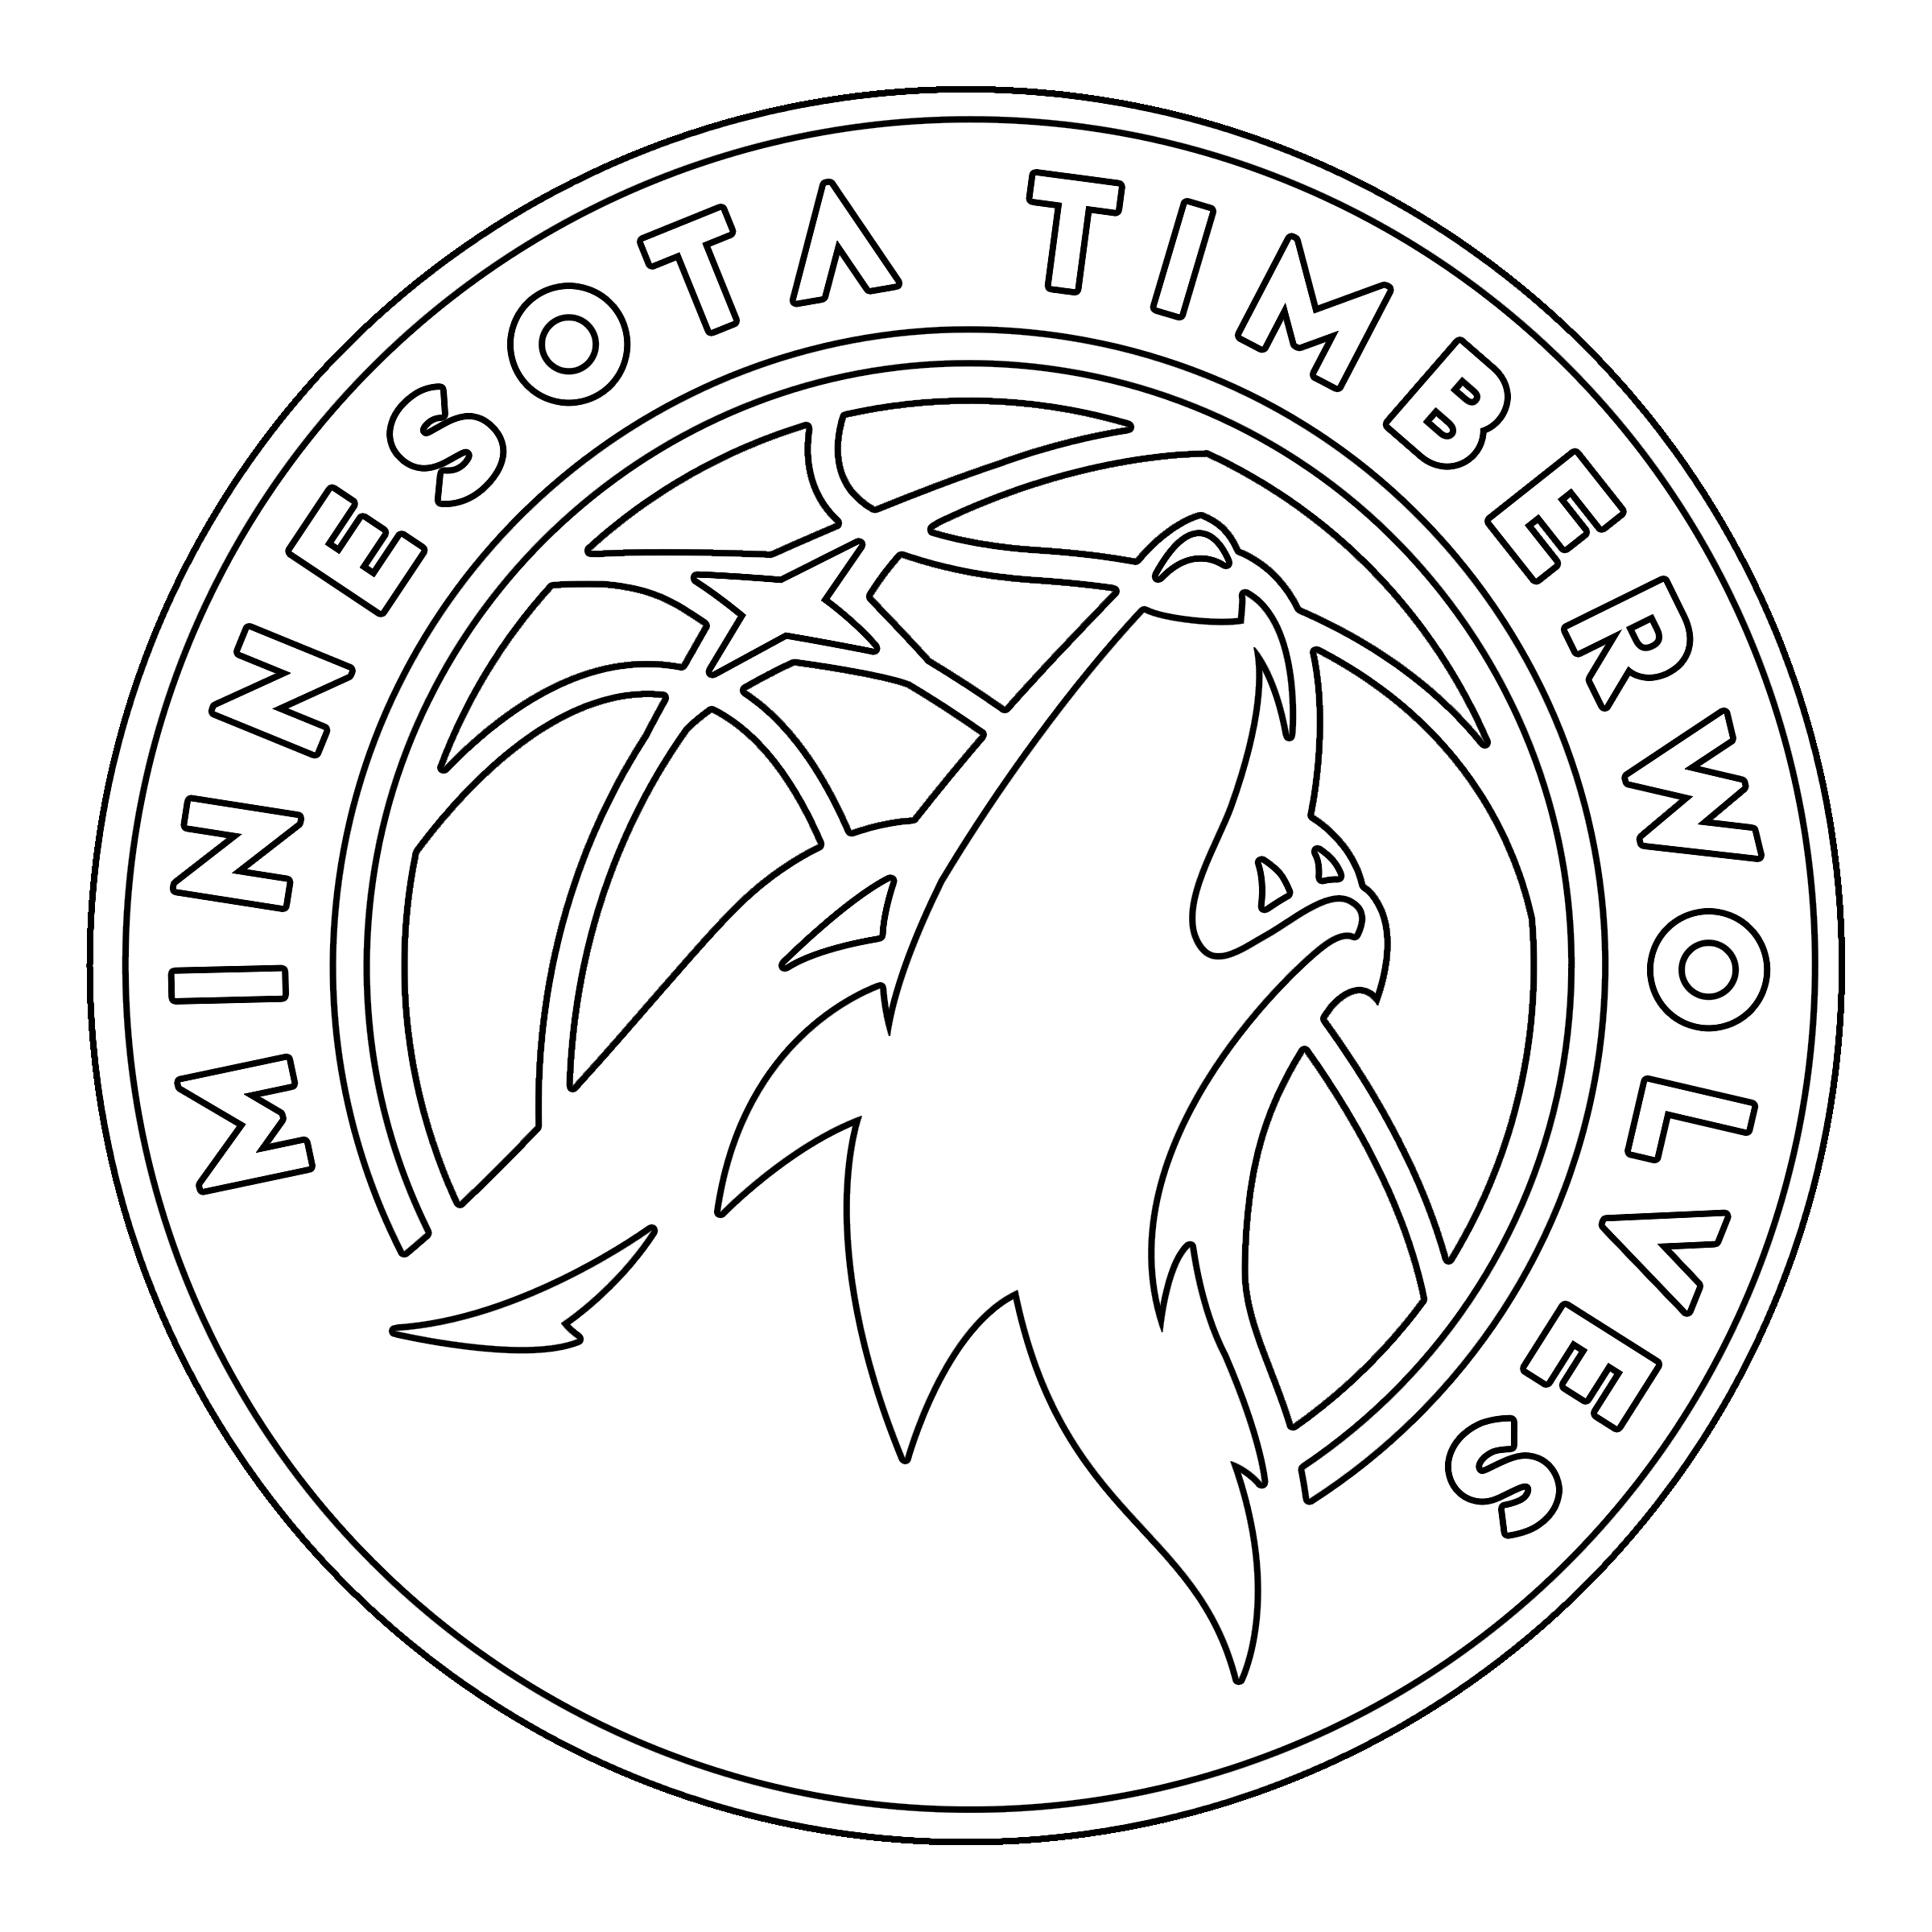 Logo Drawing At Getdrawings Free Download